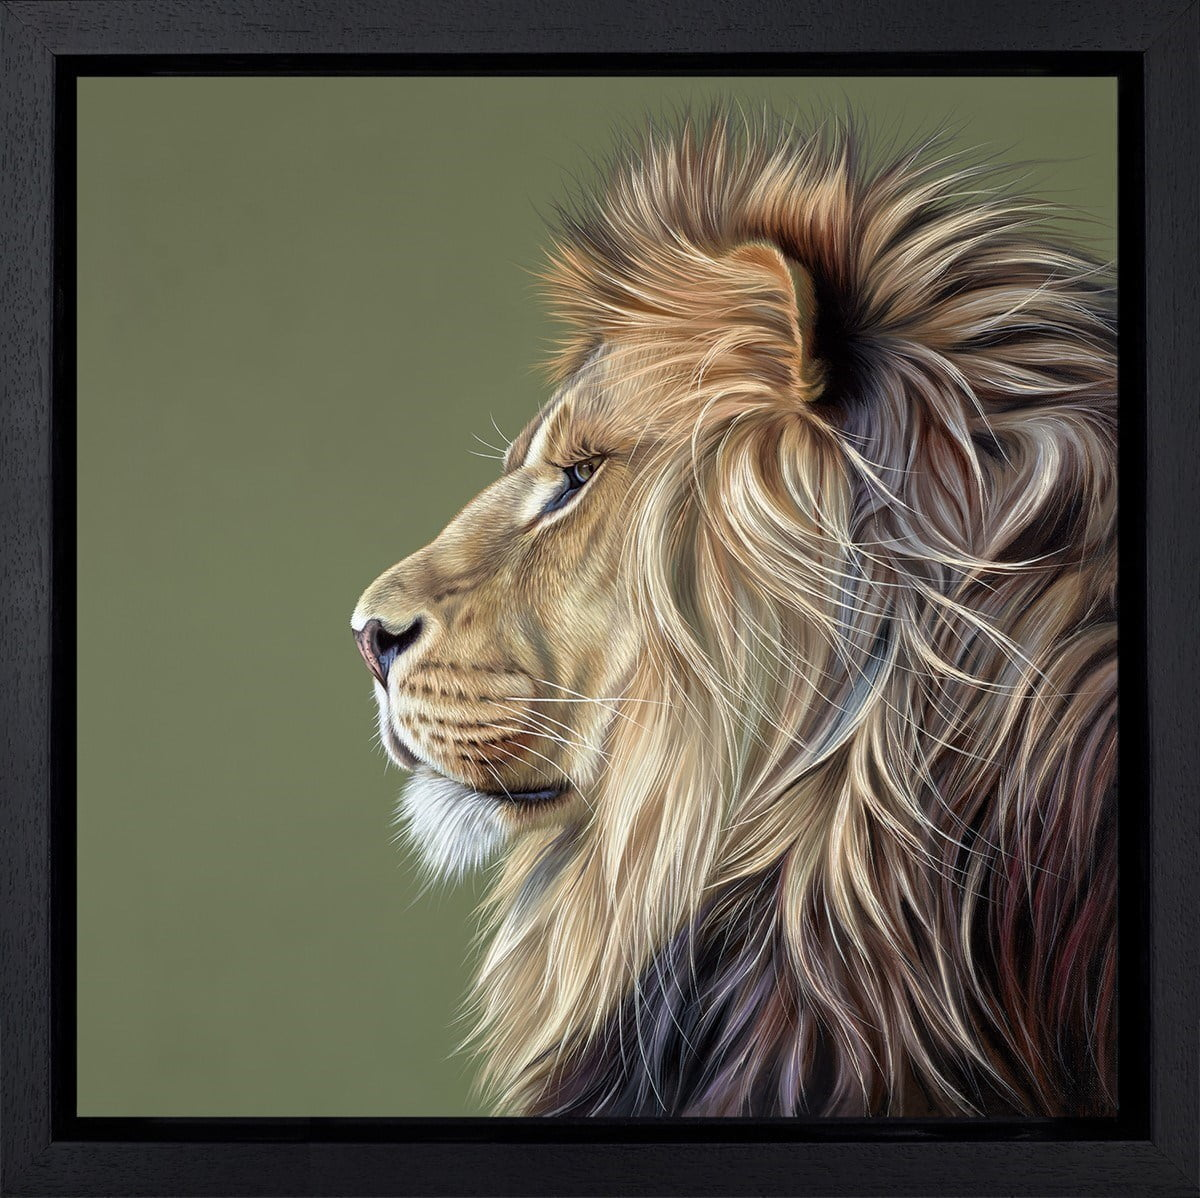 King of the Savannah ~ Darryn Eggleton